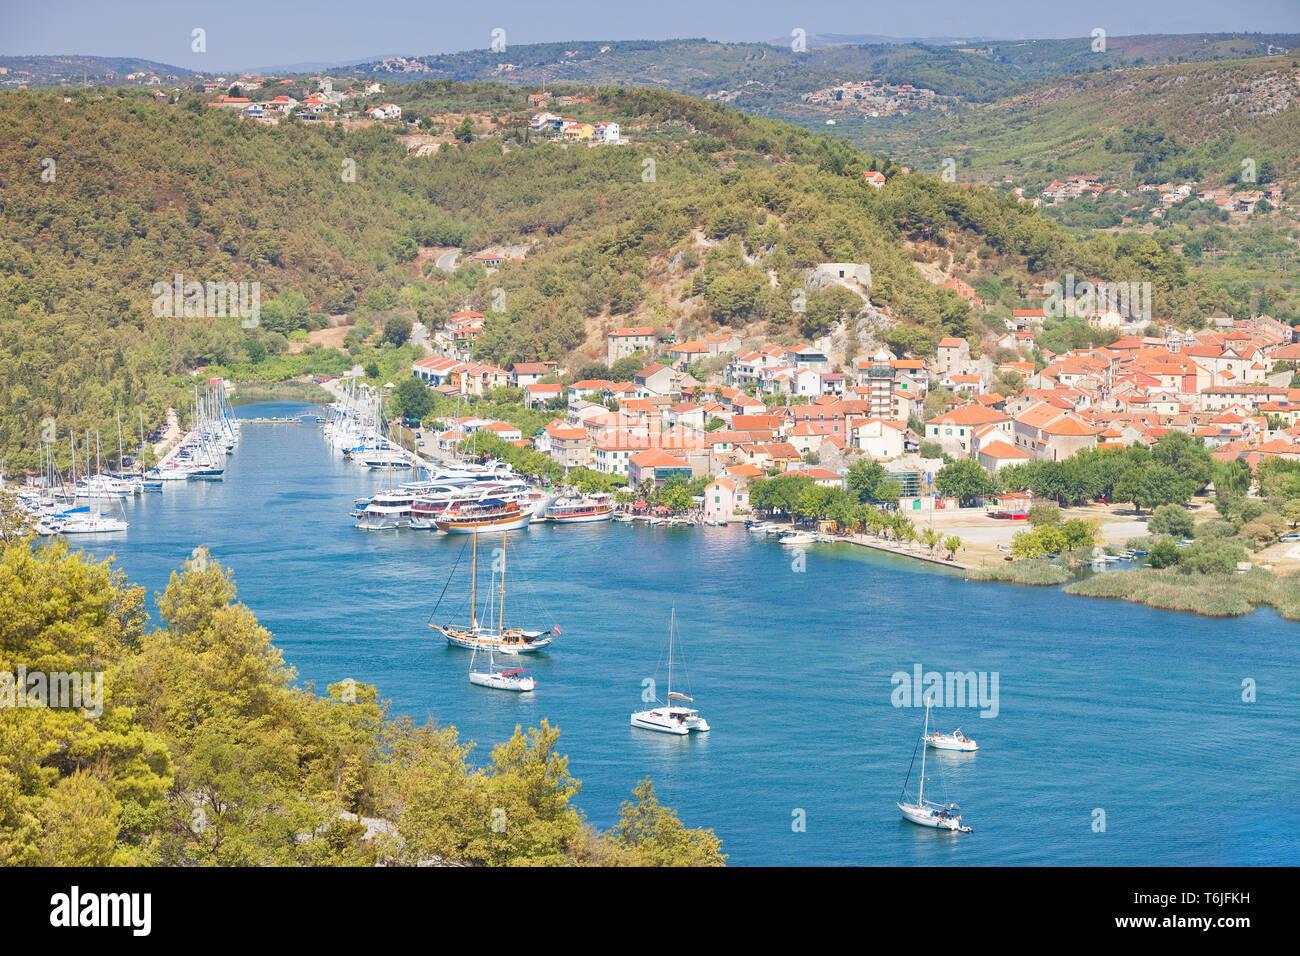 Skradin, Kroatien, Europa - Besuch der Altstadt von Skradin Stockfoto